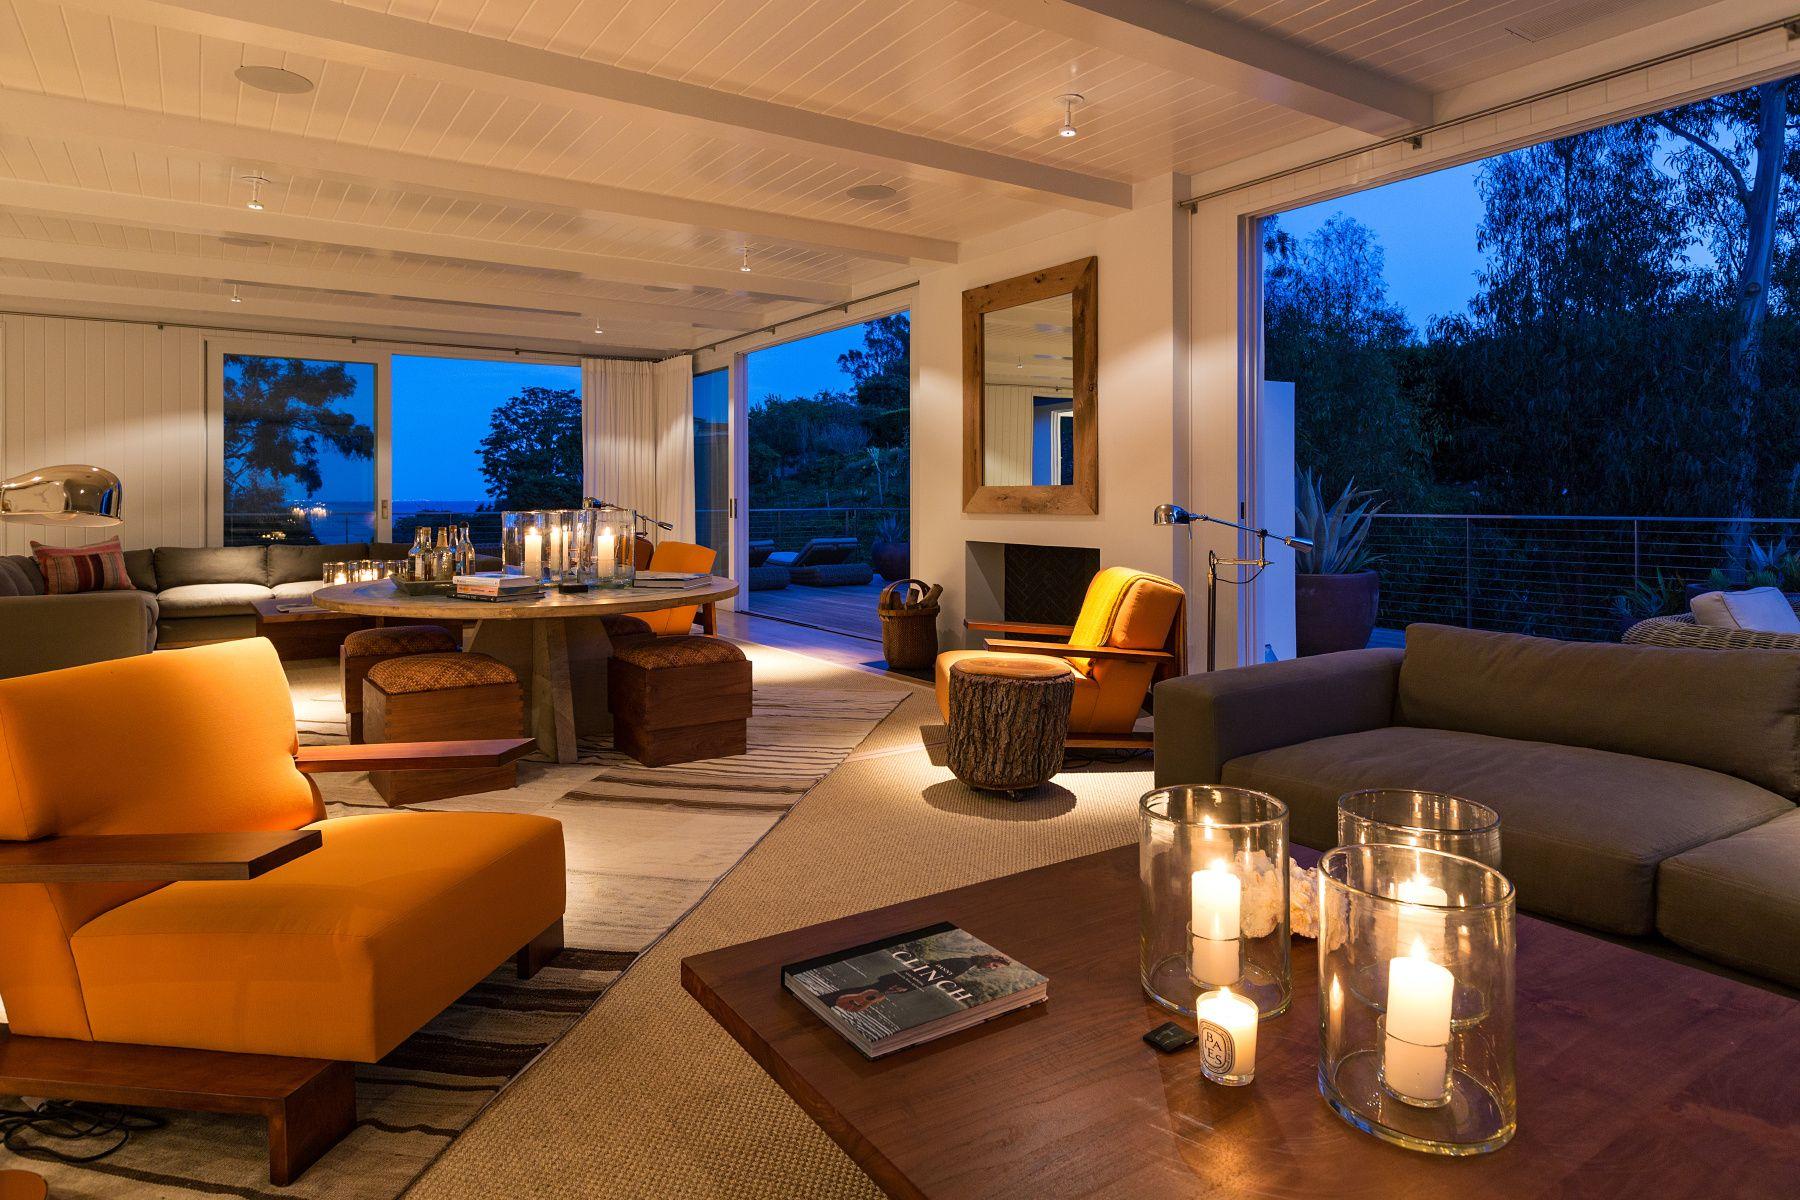 Malibu Real Estate Agent | Luxury Beach Homes in Malibu ...